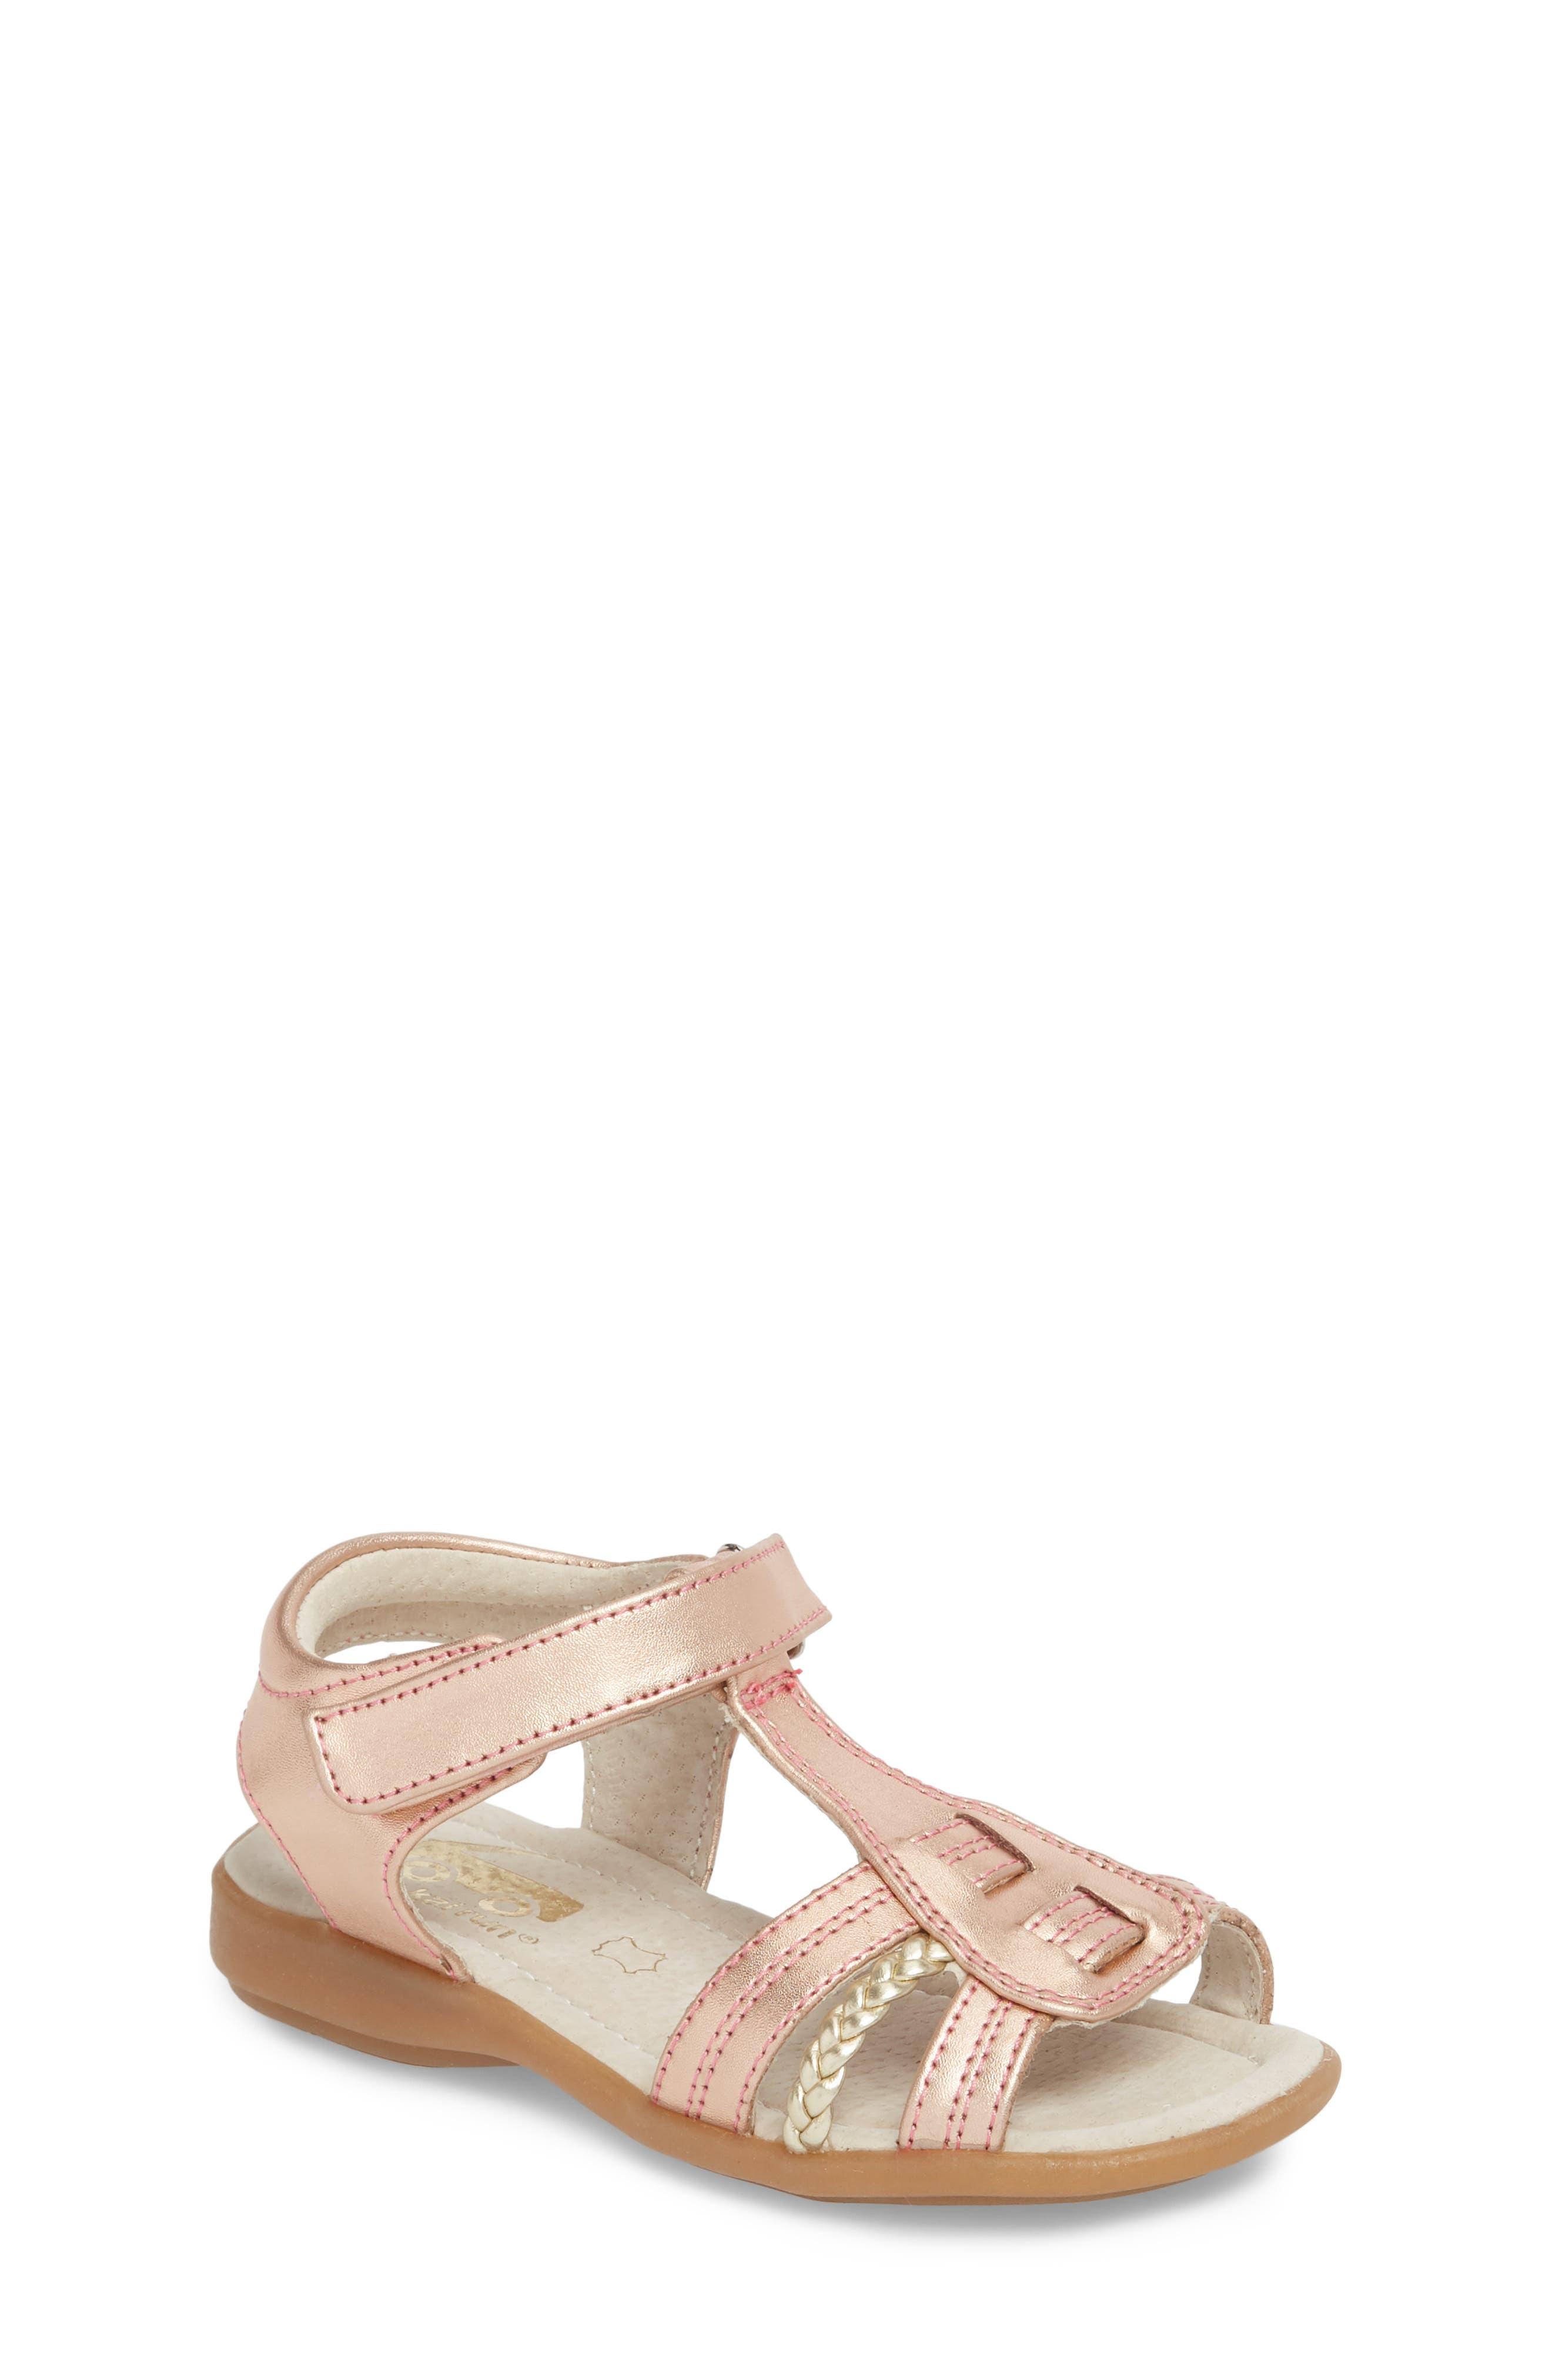 Hadley Metallic Sandal,                             Main thumbnail 1, color,                             Rose Gold